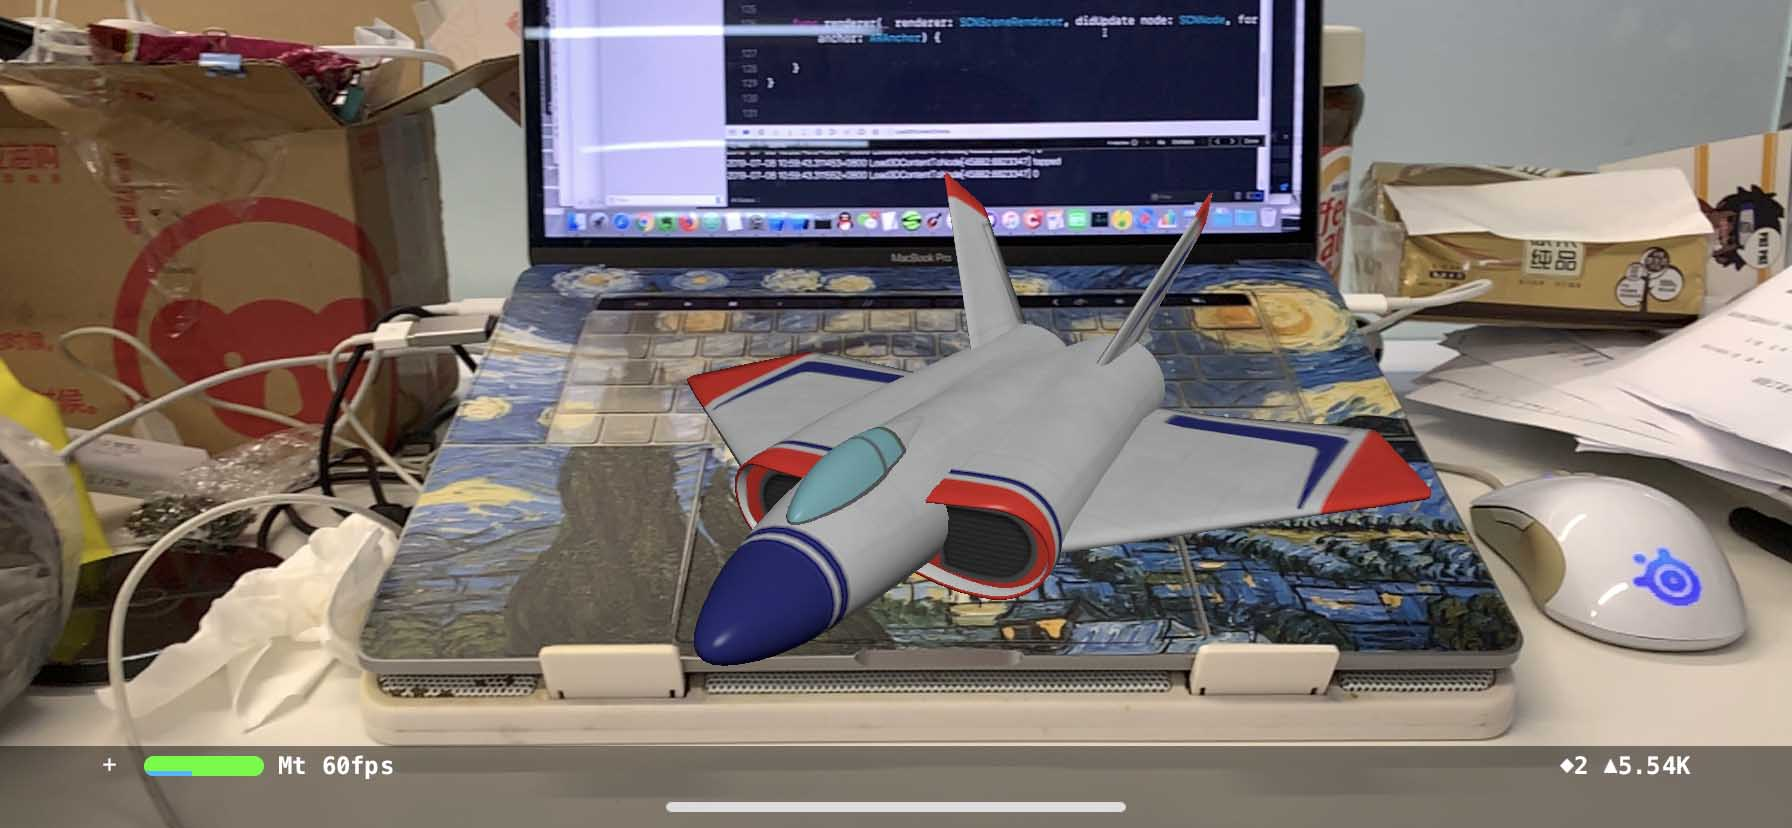 ARKit和SceneKit实现3D模型交互swift scn dae - 学习笔记- CSDN博客